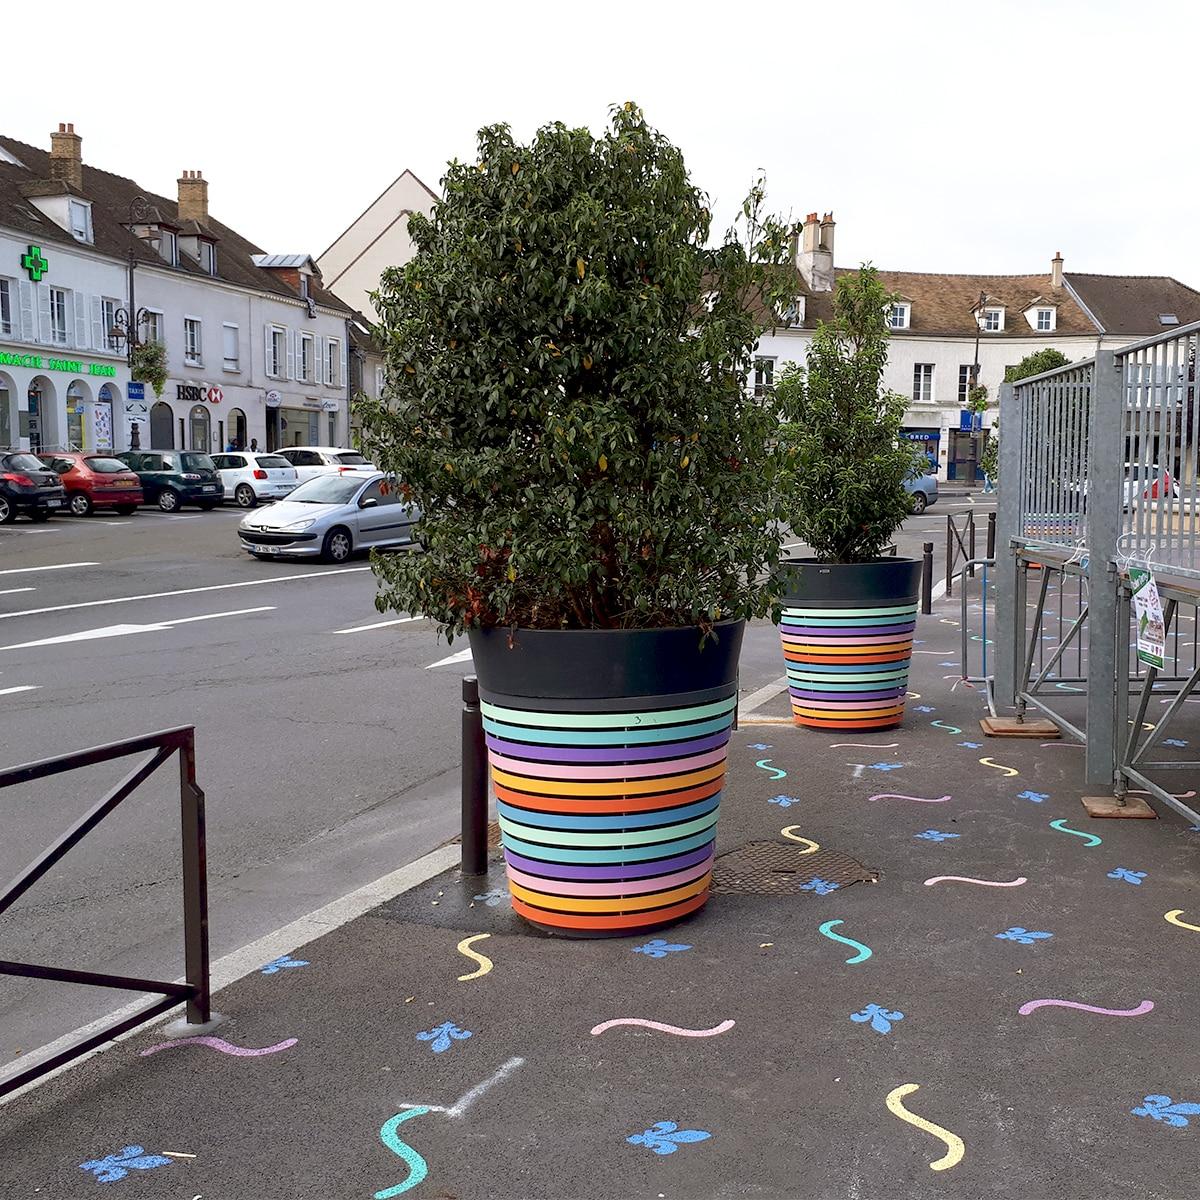 ATECH-roadside-design-street-furniture-planter-pastel